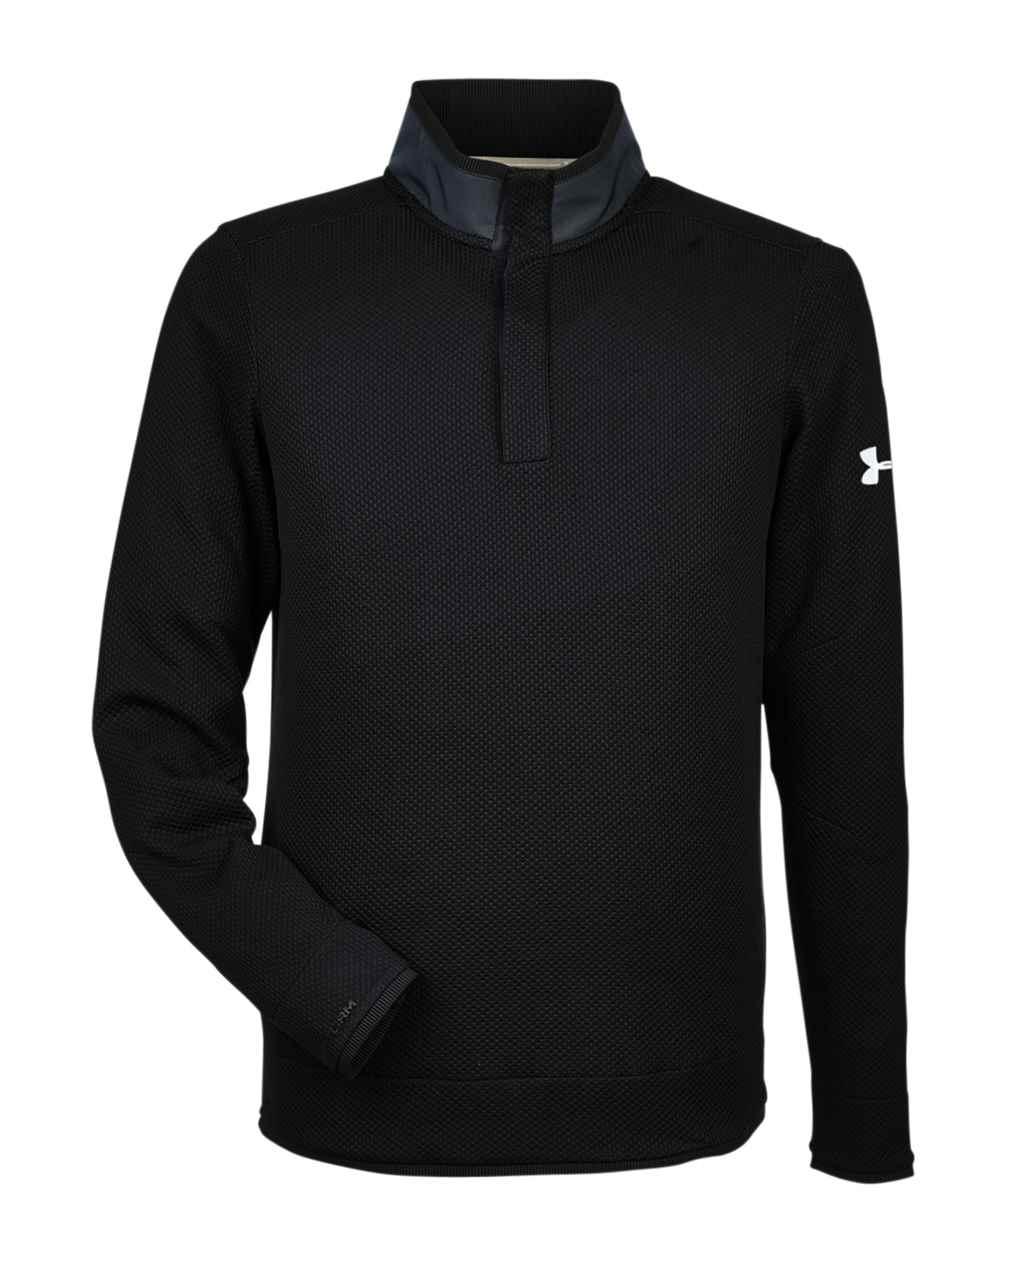 Picture of Under Armour Men's Corporate Quarter Snap Up Sweater Fleece